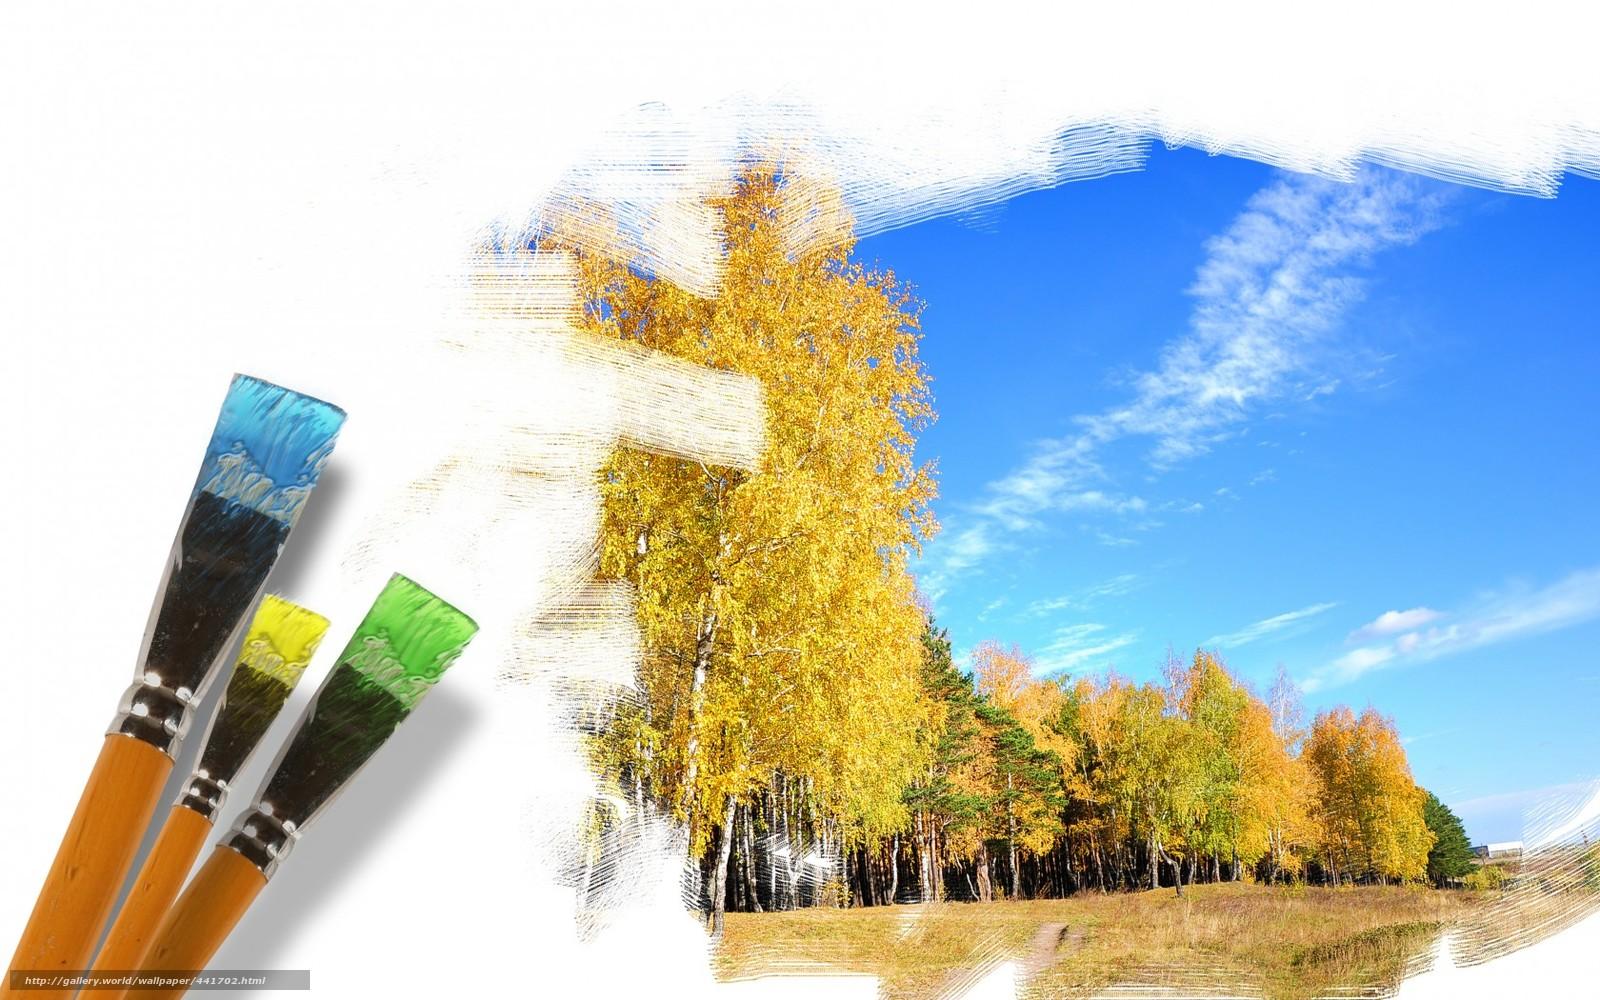 download wallpaper indian summer brush picture sky free desktop wallpaper in the resolution. Black Bedroom Furniture Sets. Home Design Ideas